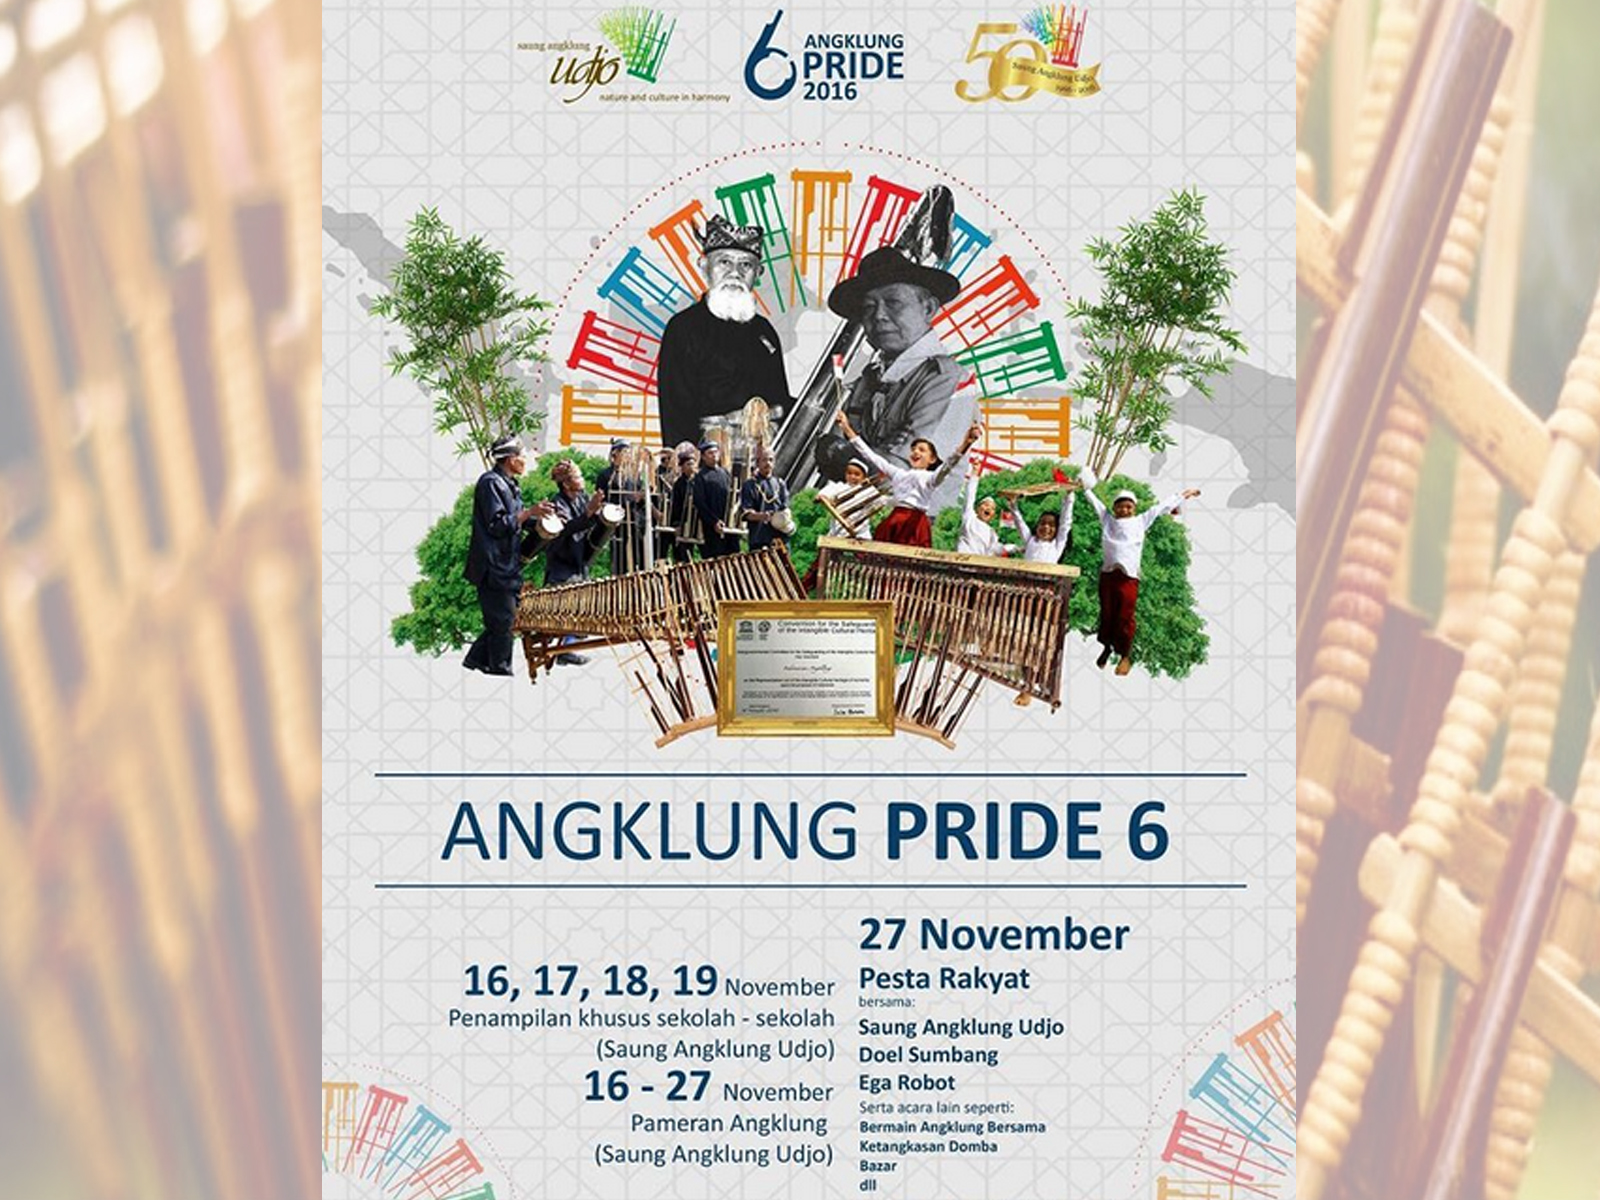 Event Hari Angklung Sedunia 2016 di Bandung